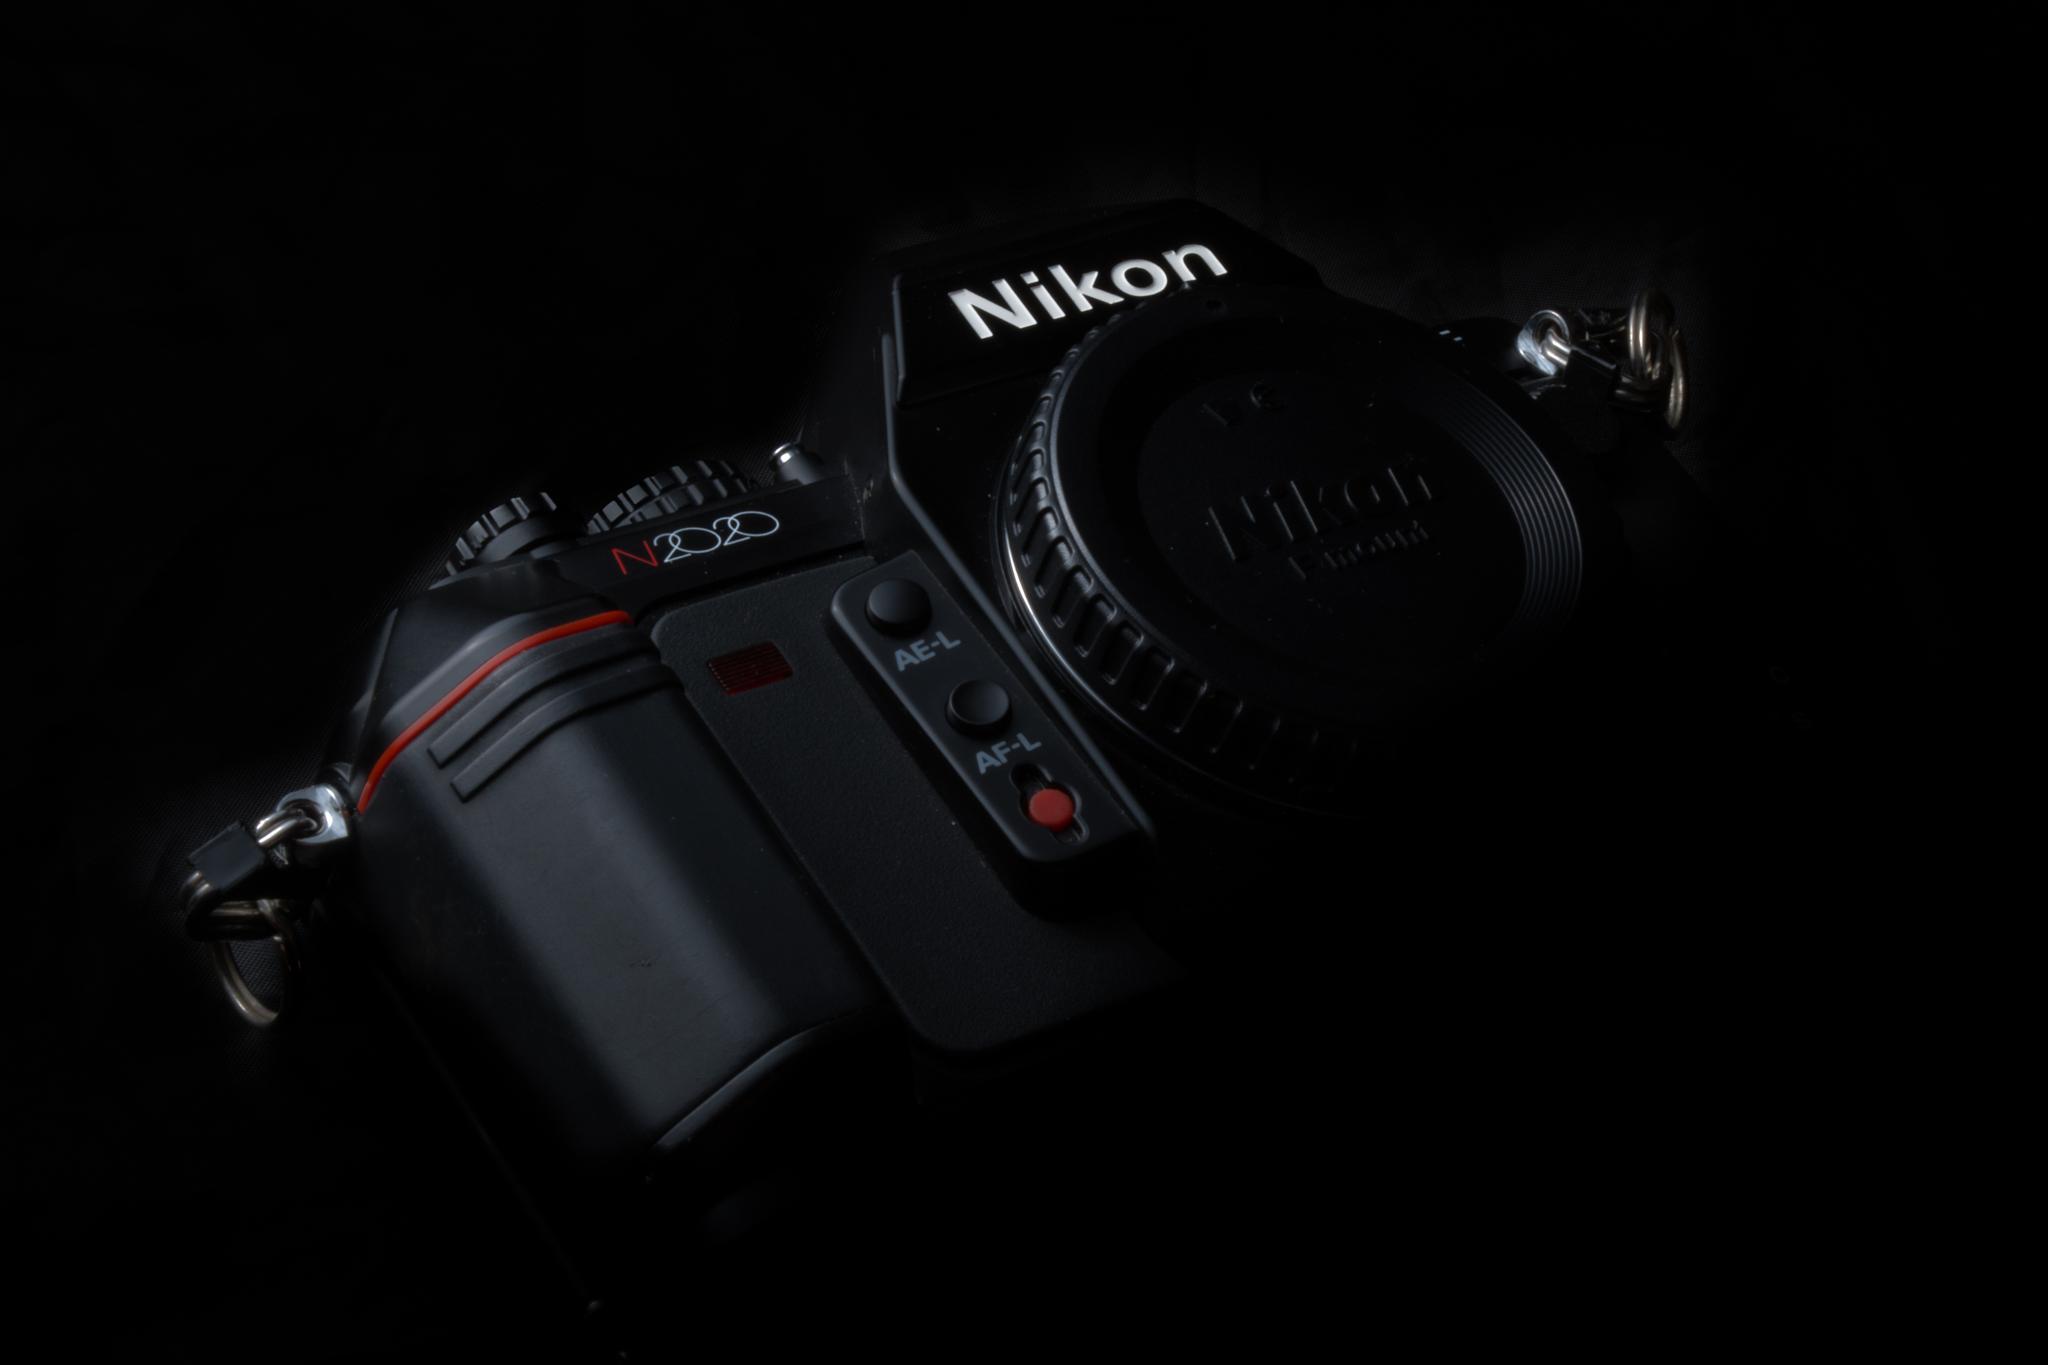 NIKON N2020 / F-503 by julian95rodriguez